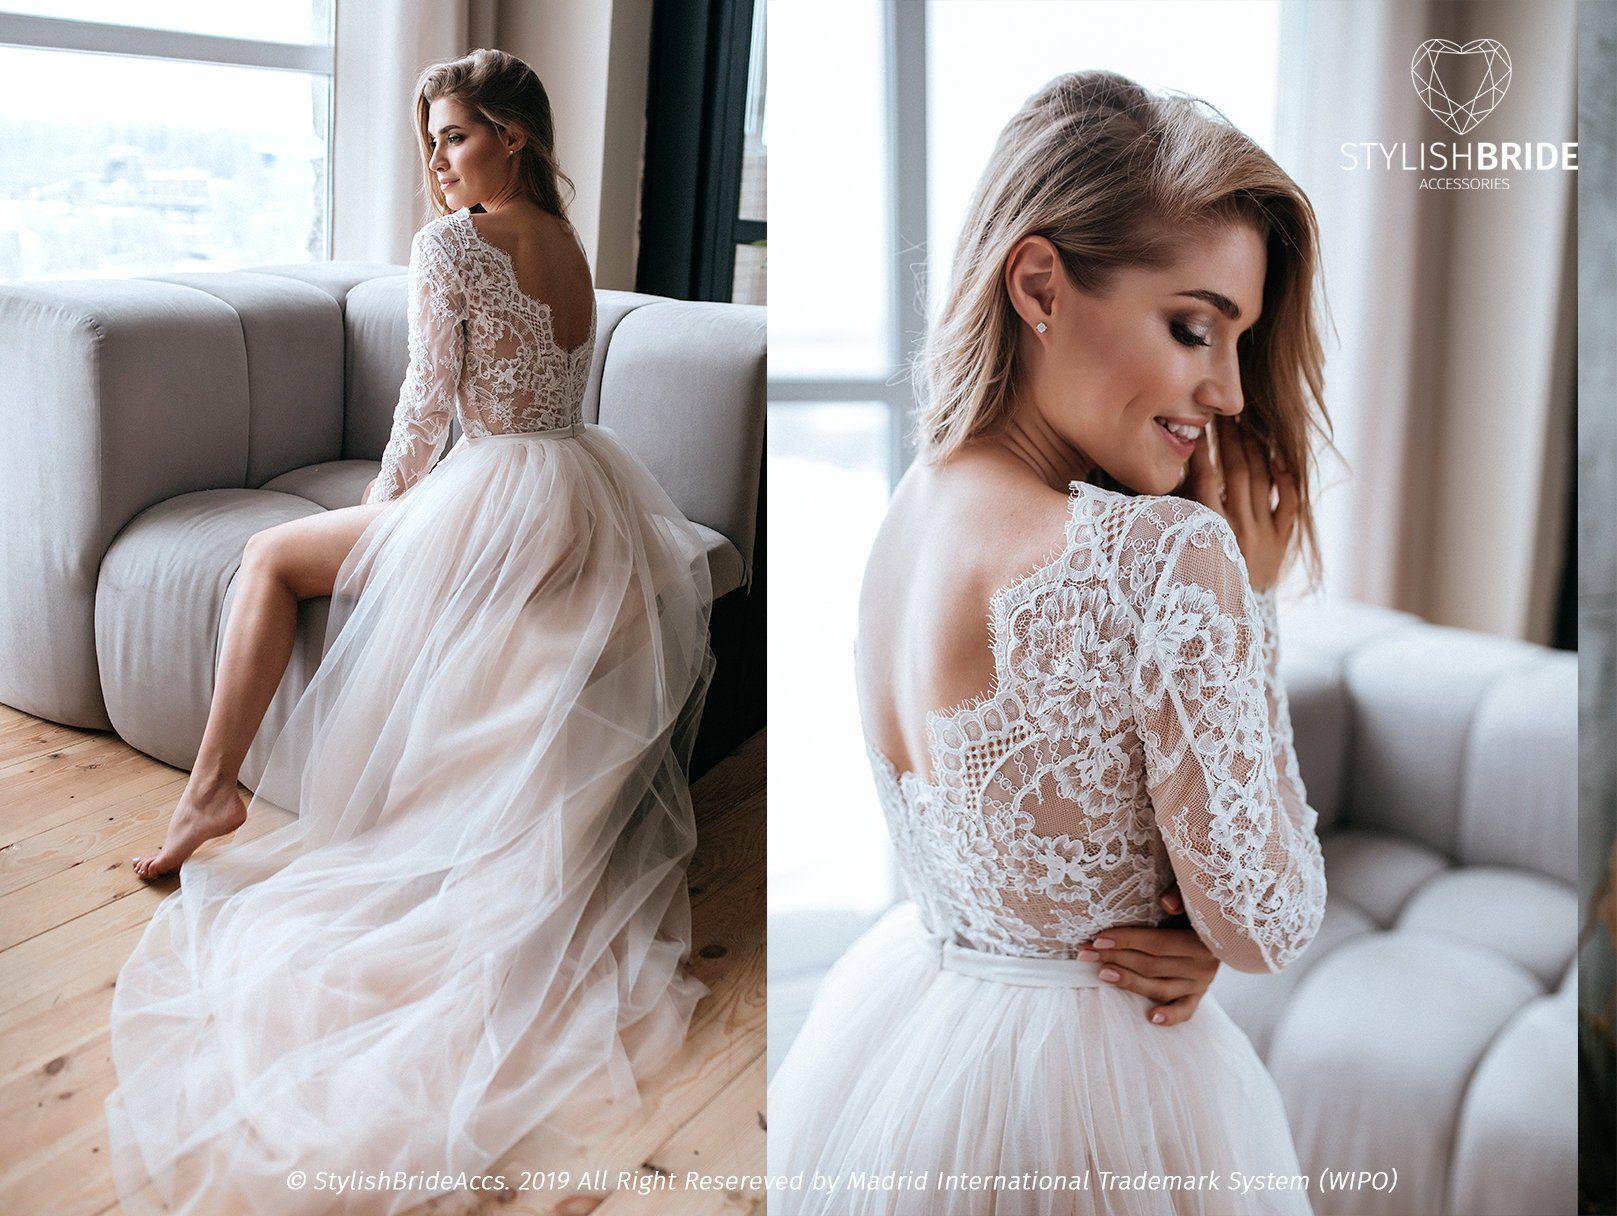 Aster Two Piece Wedding Tulle Dress Bodysuit Lace Bodysuit Etsy Bridal Separates Wedding Dress Long Sleeve Wedding Dresses